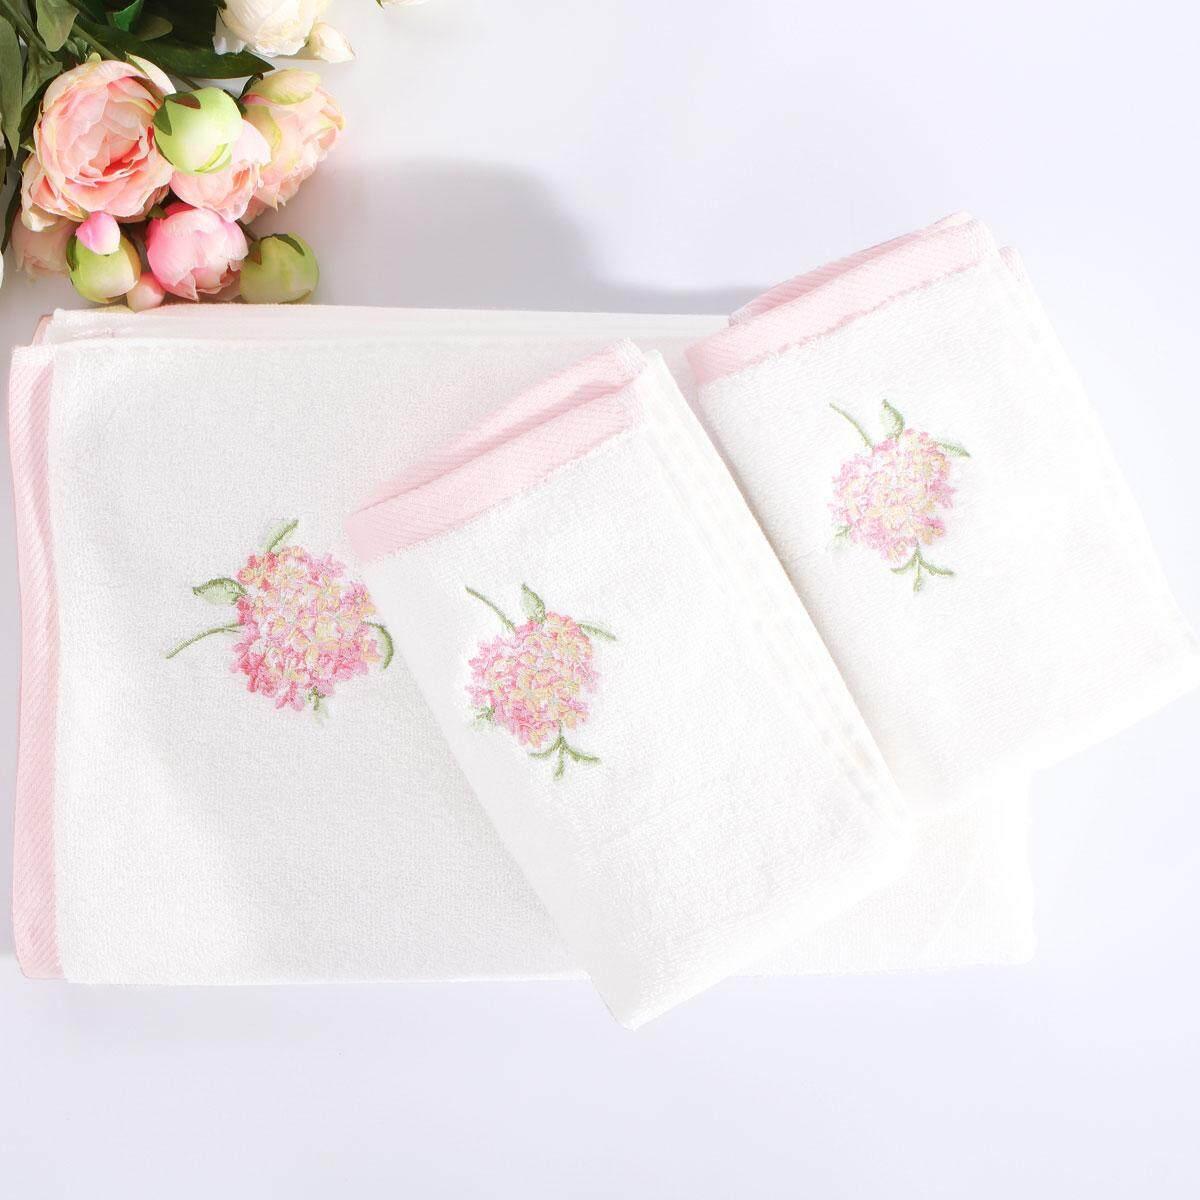 ... Buy Sell Cheapest Mandi Katun Bordir Best Quality Product Deals Yatis Selimut Polos Halus 160 X